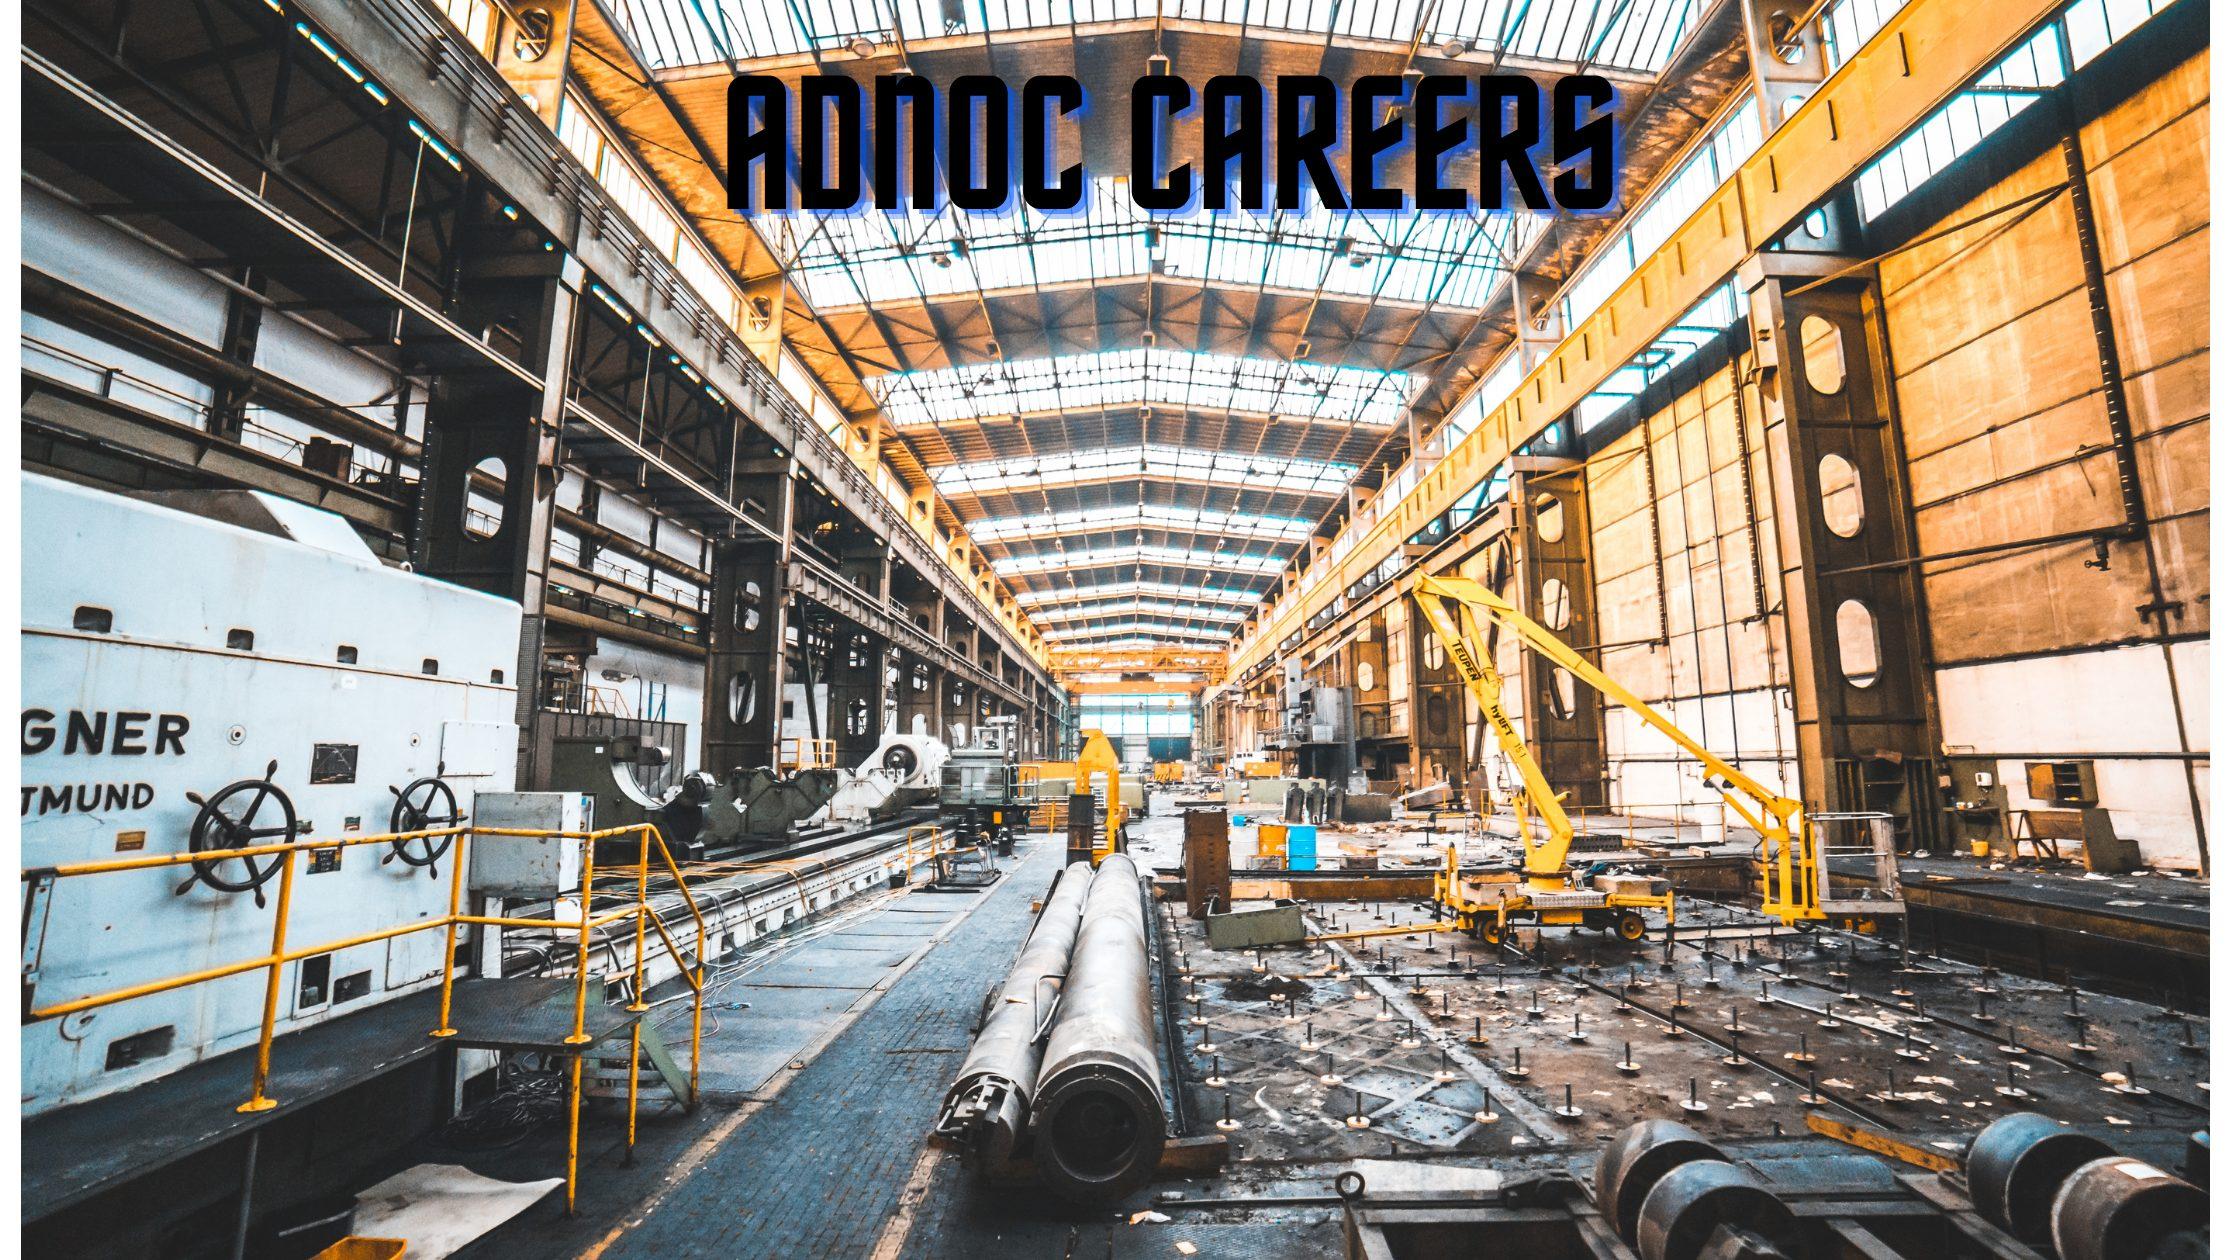 Adnoc Careers Jobs in Dubai | UAE | Middle East